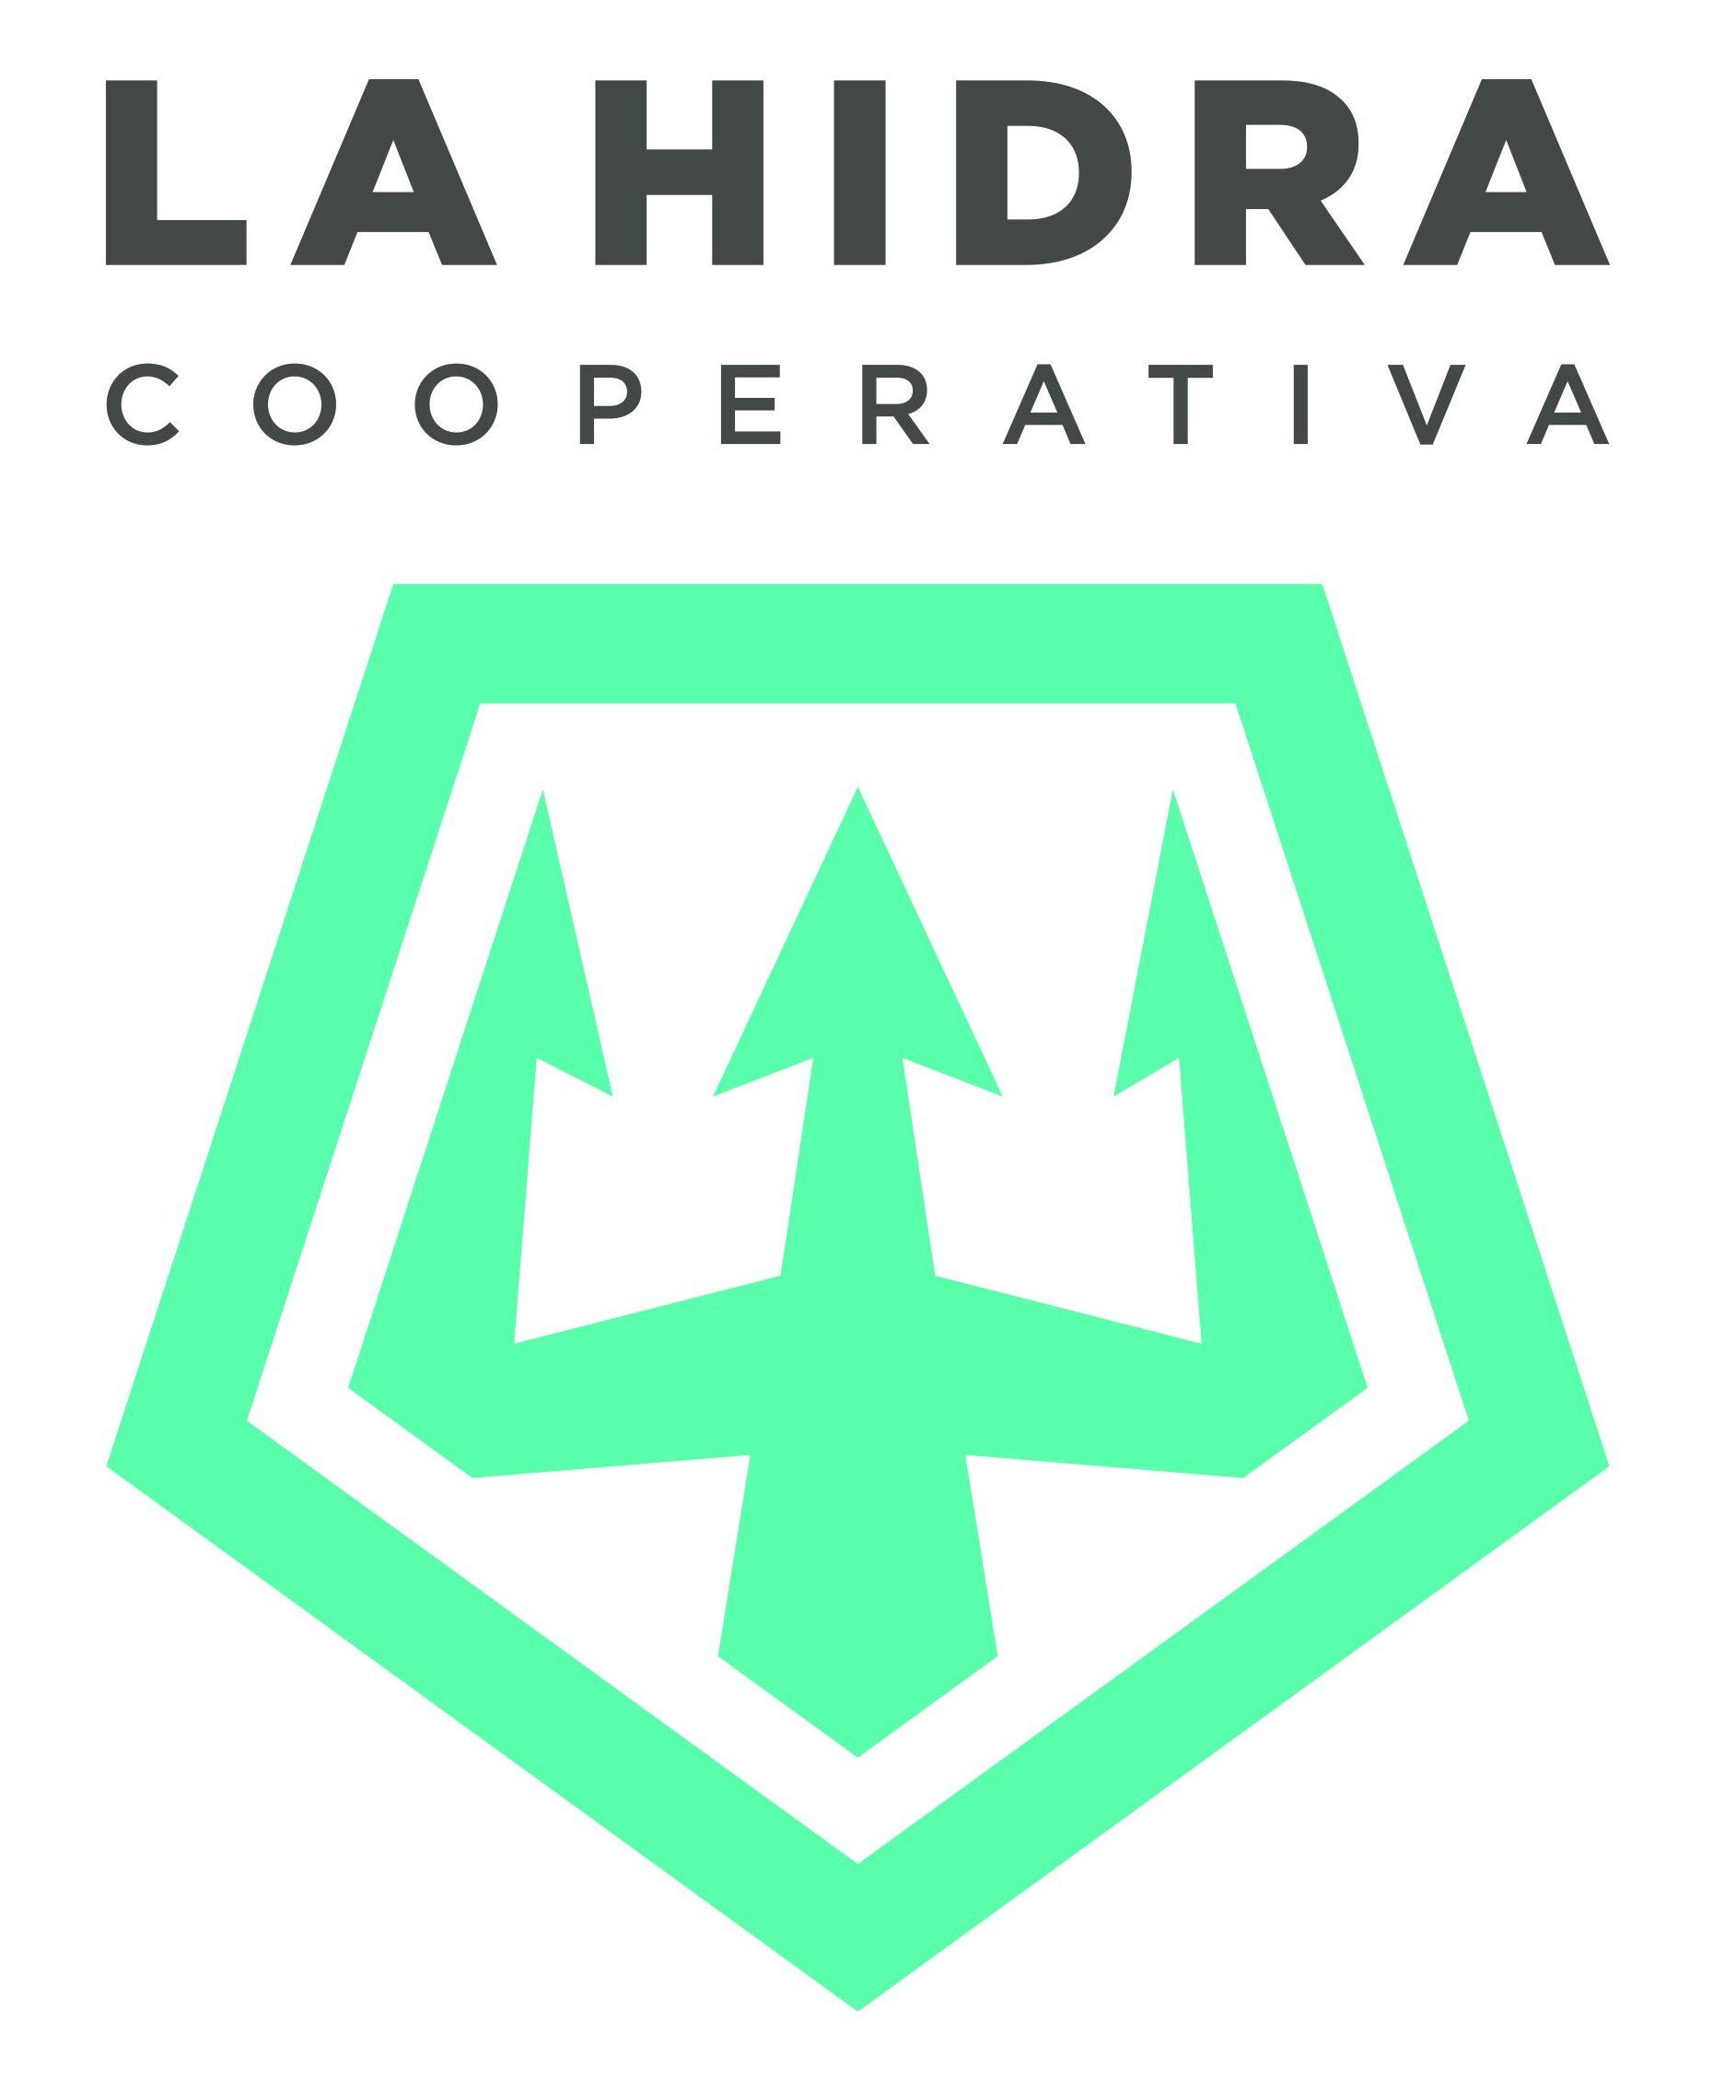 La Hidra Cooperativa